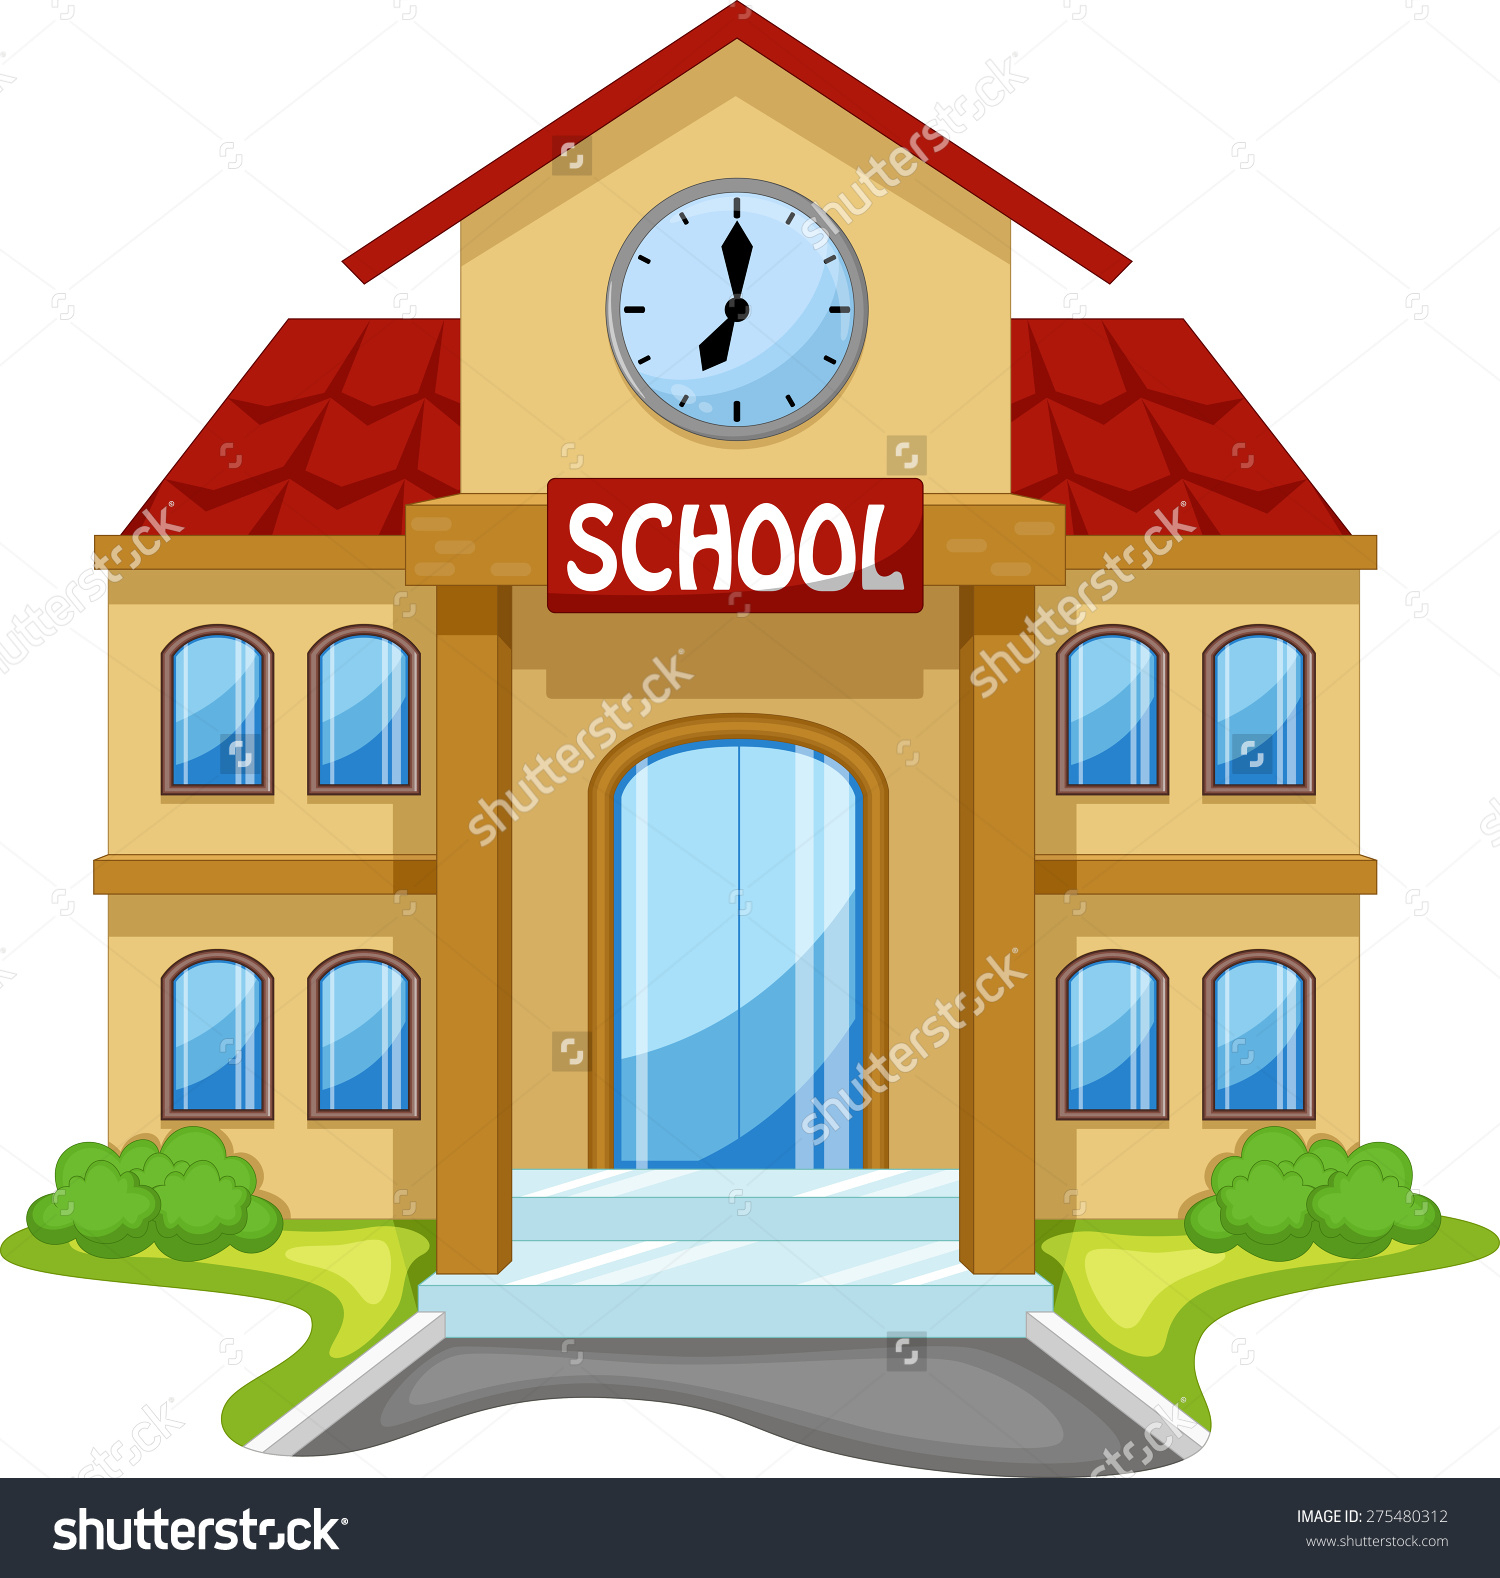 1500x1578 Cartoon Drawing Of A School Cartoon Drawing Of A School